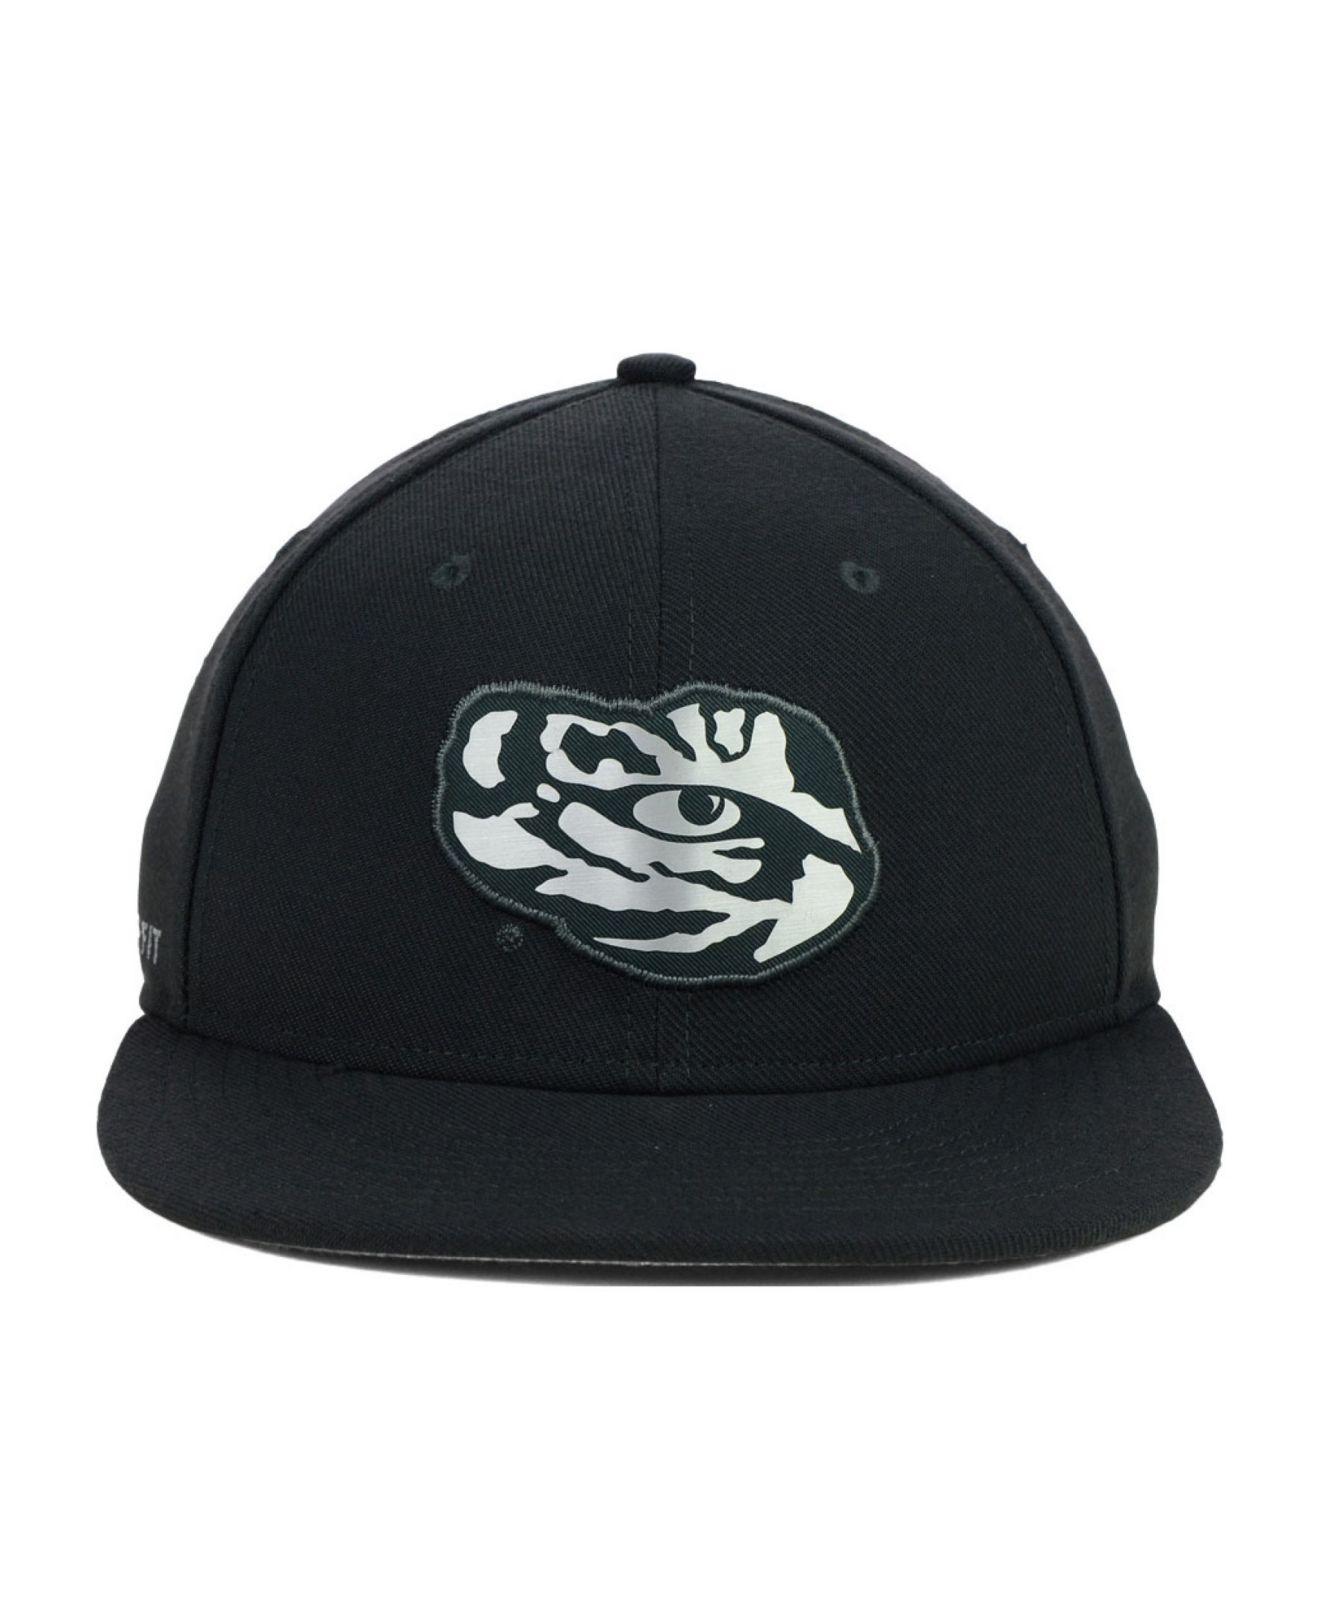 size 40 84b95 ec955 Lyst - Nike Lsu Tigers True Platinum Swooshflex Cap in Black for Men